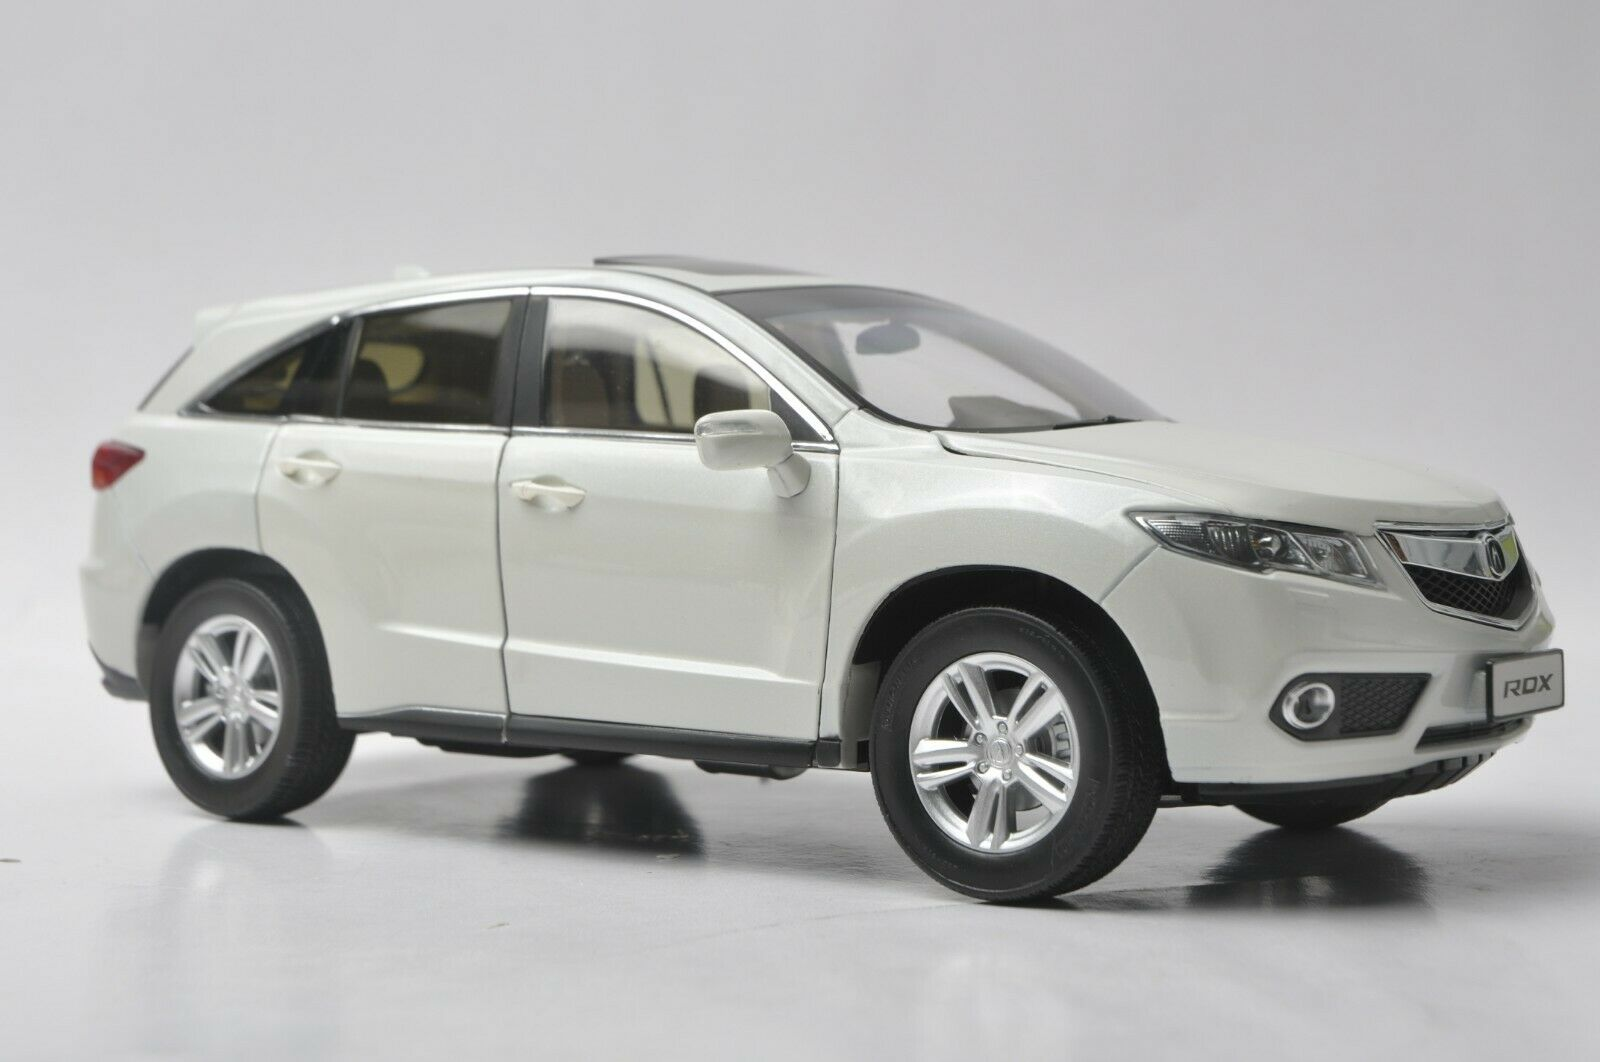 Acura RDX 2013 car model in scale 1 18 White